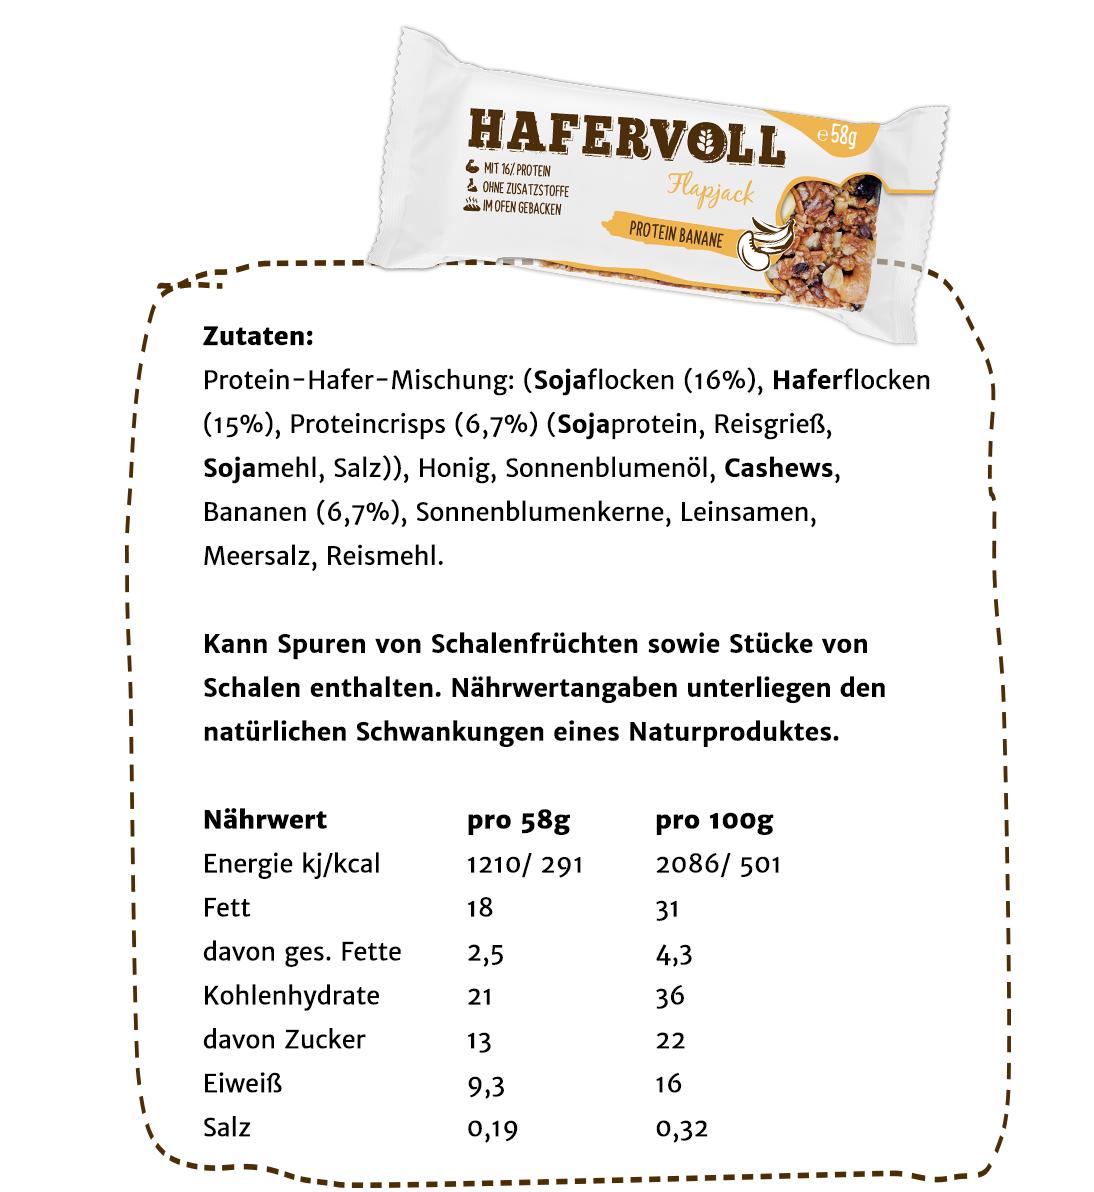 Hafervoll 6er Box Protein Banane Flapjack Hafervoll